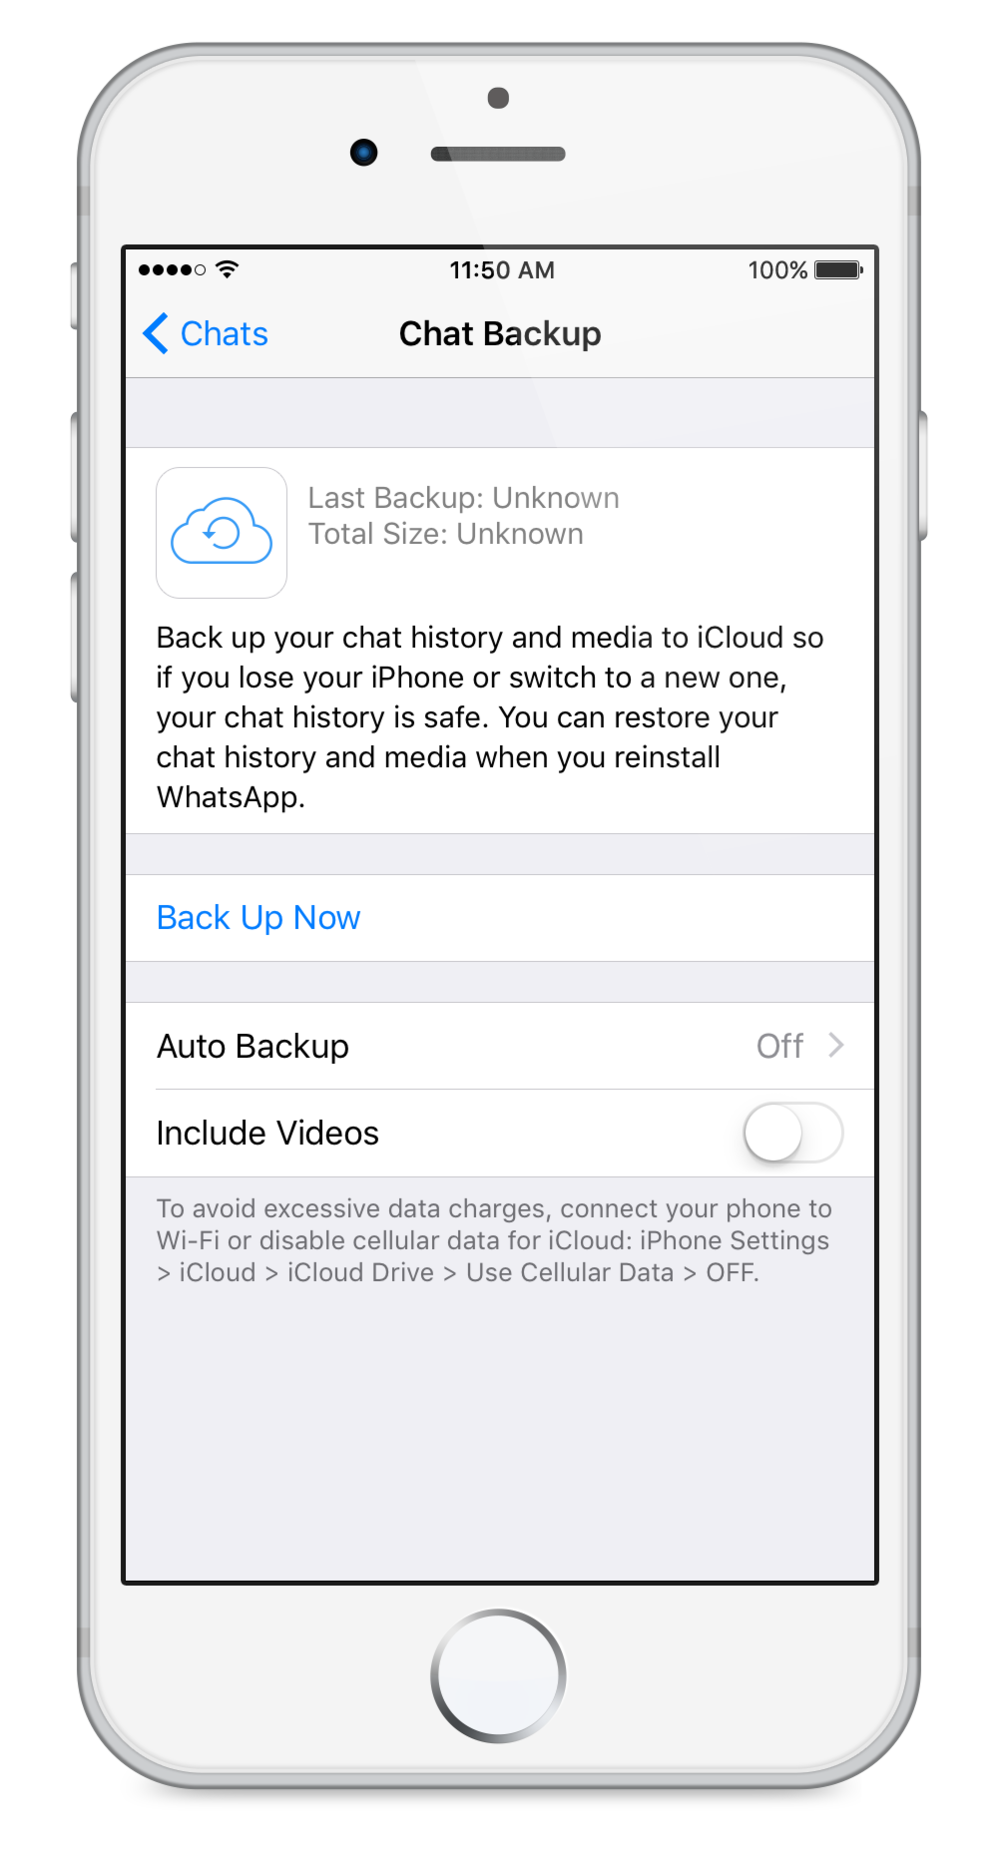 whatsapp-iphone-backup.png